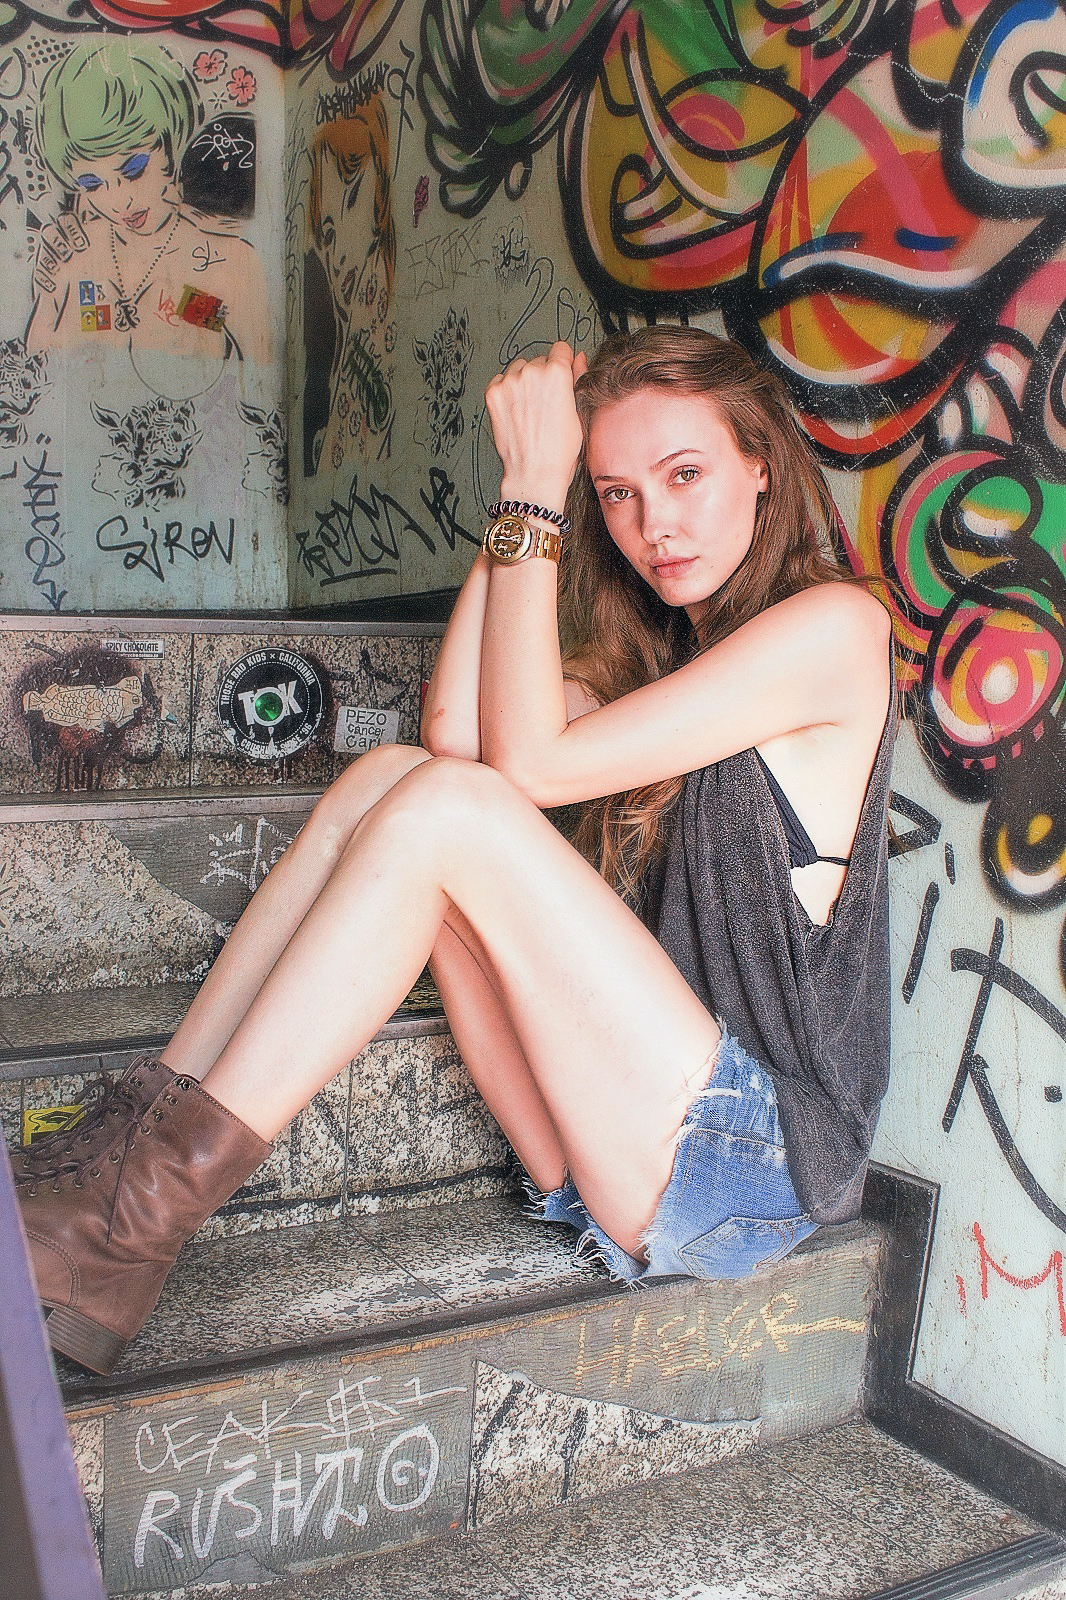 Model Ysa Horst 2013 - Nikon